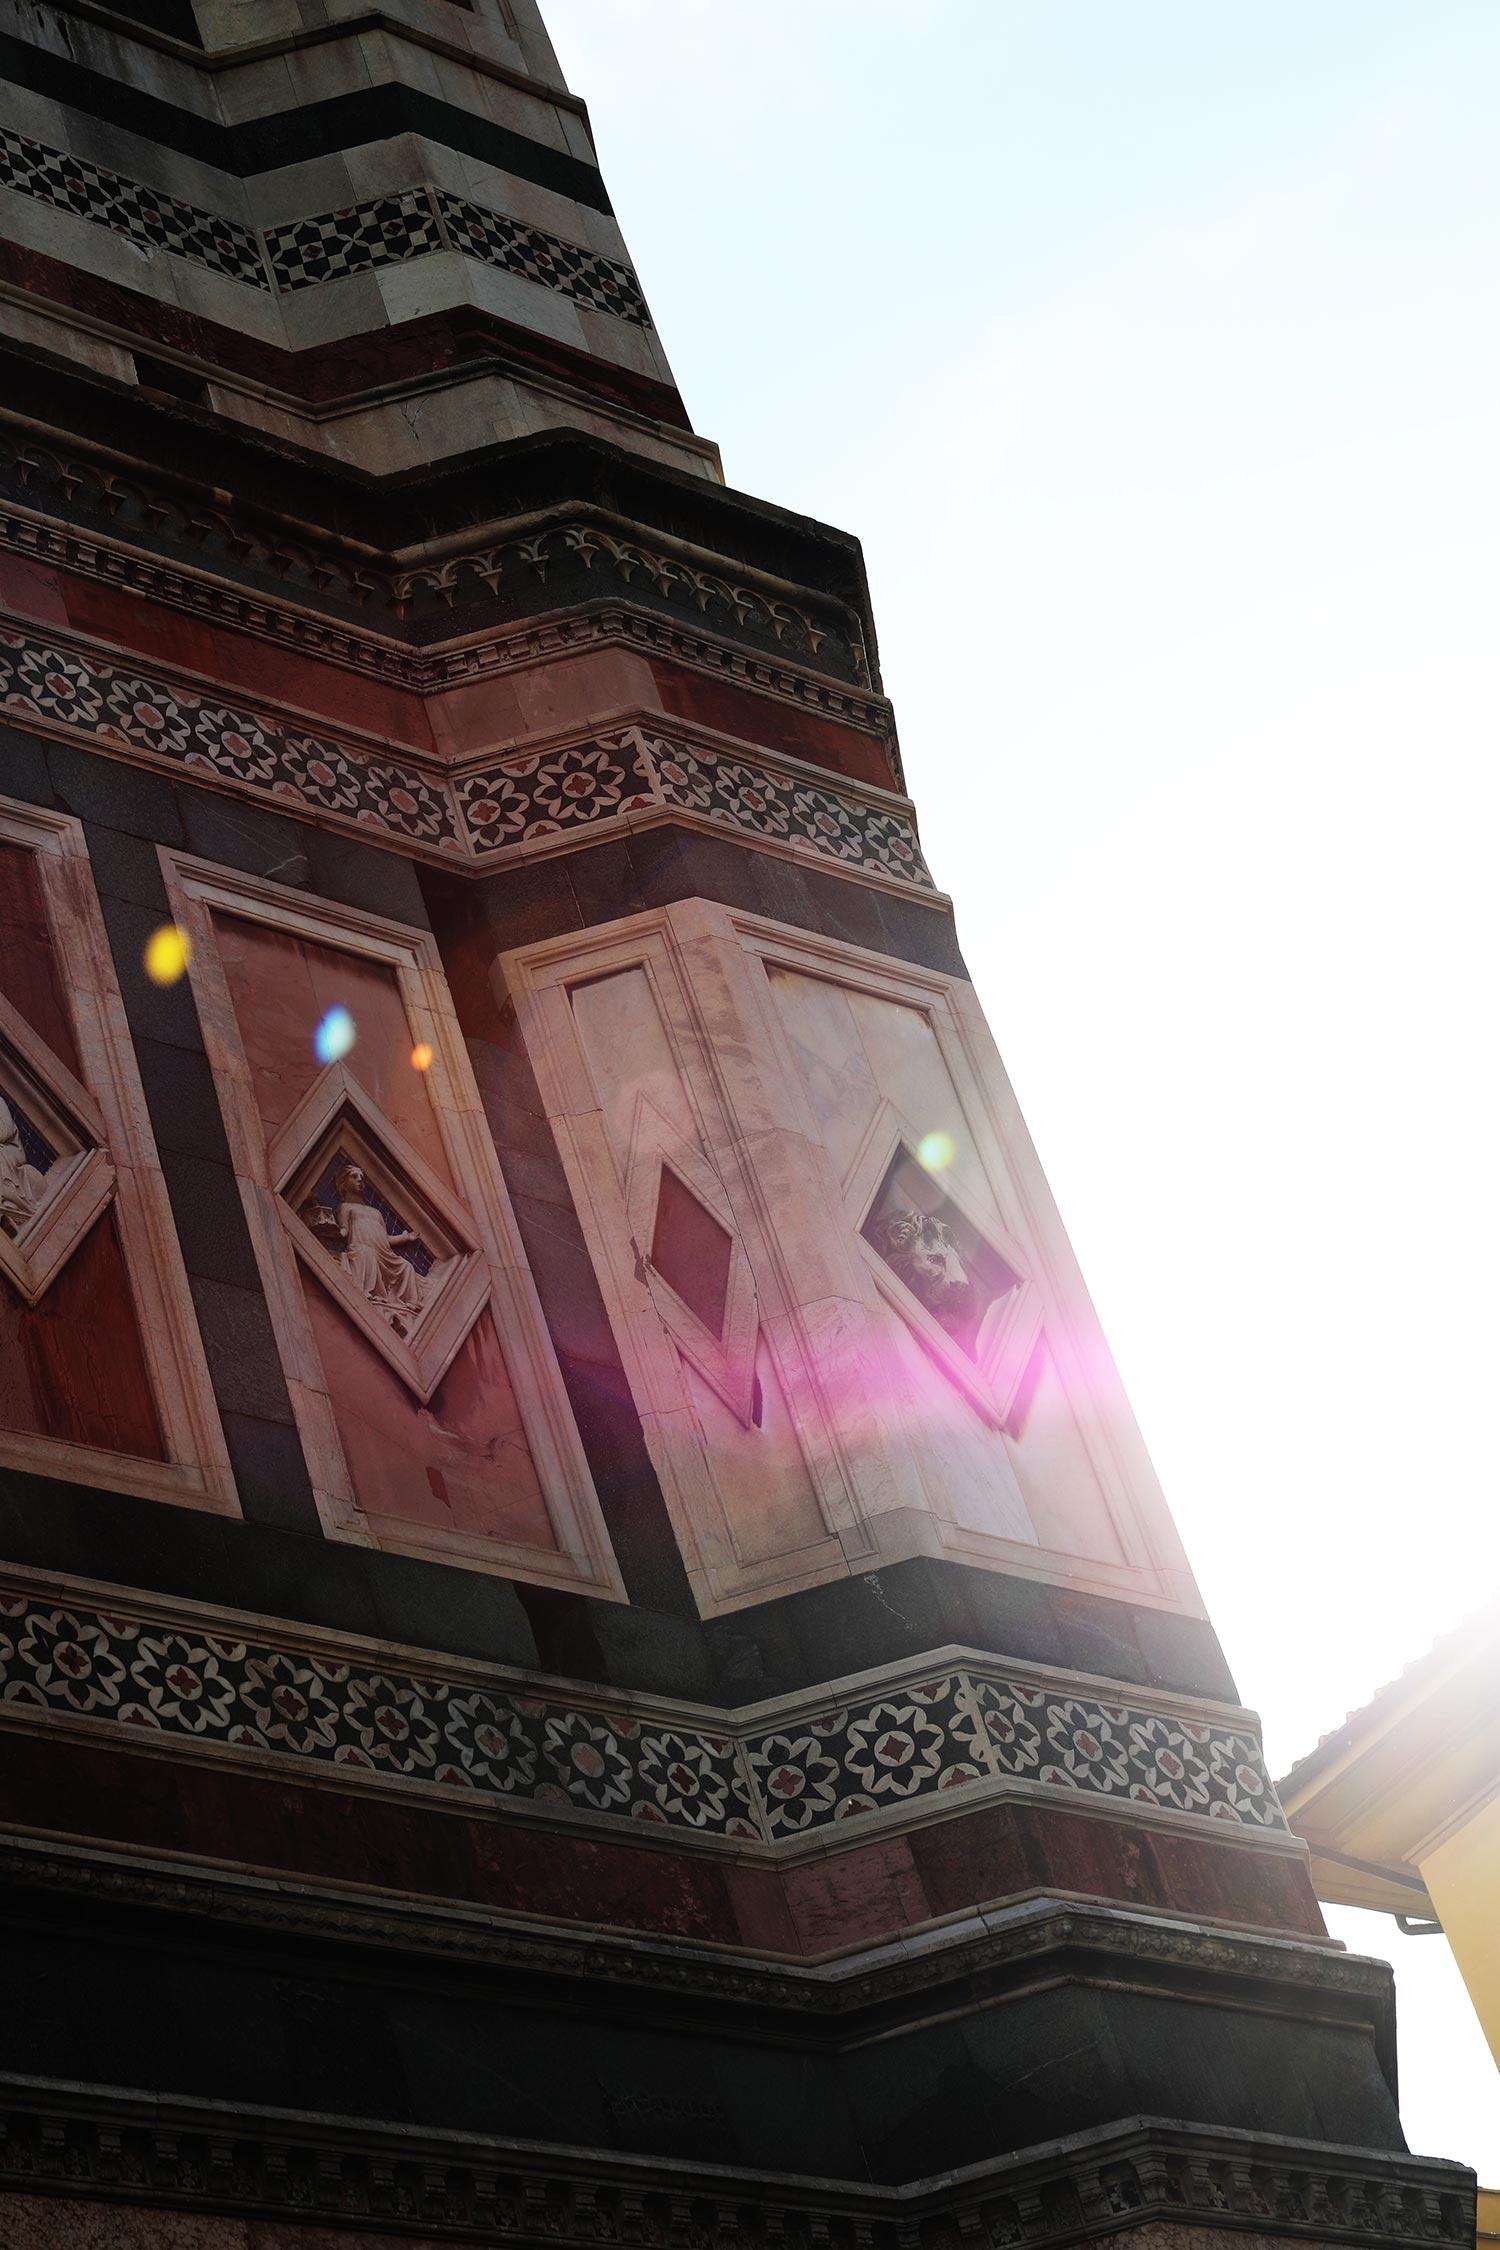 Pilgrimage_Rome_4370_Florence.jpg